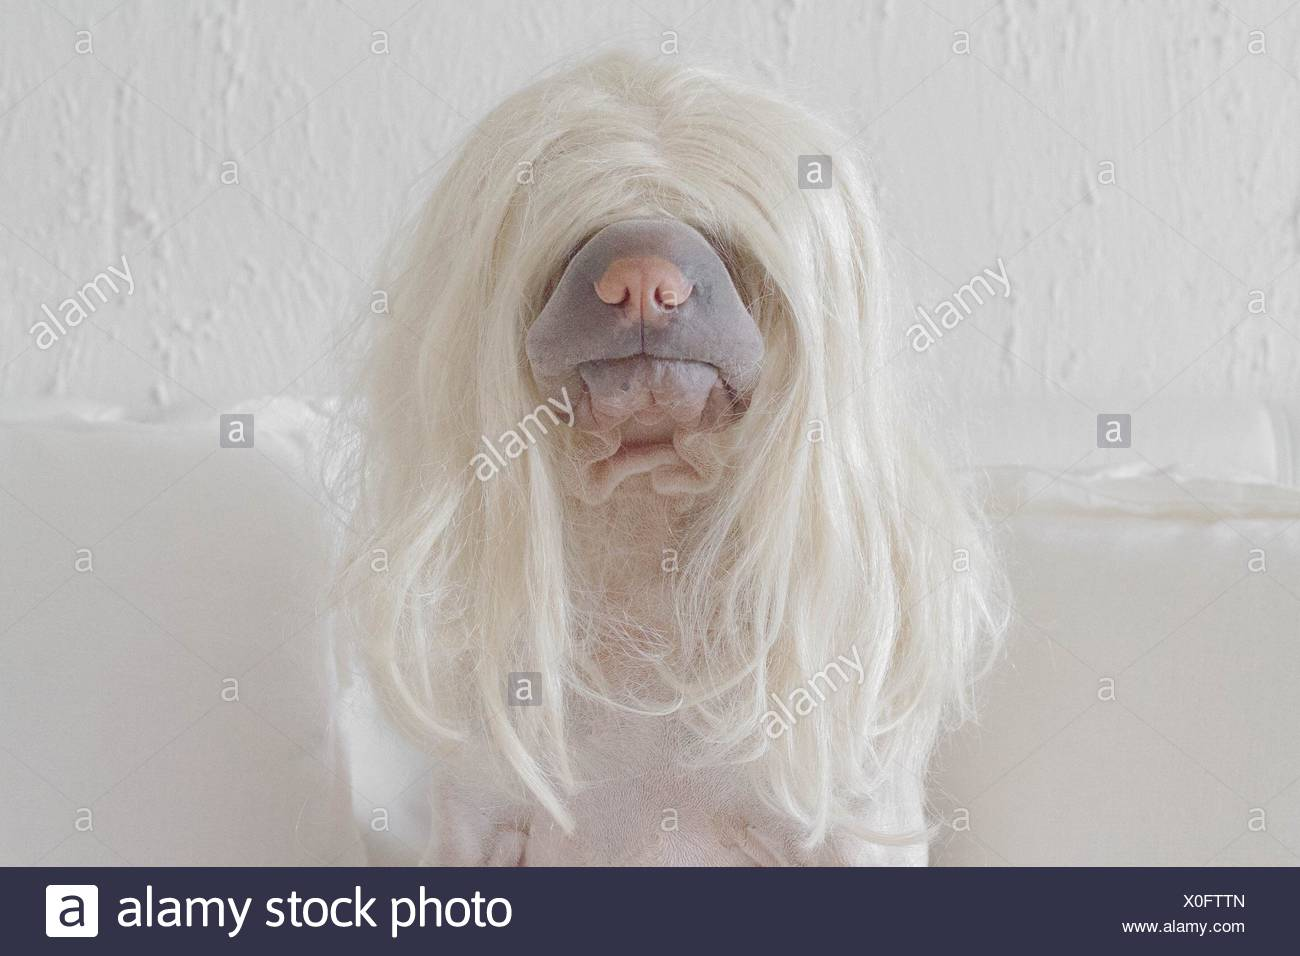 Dog wearing a long blonde wig - Stock Image